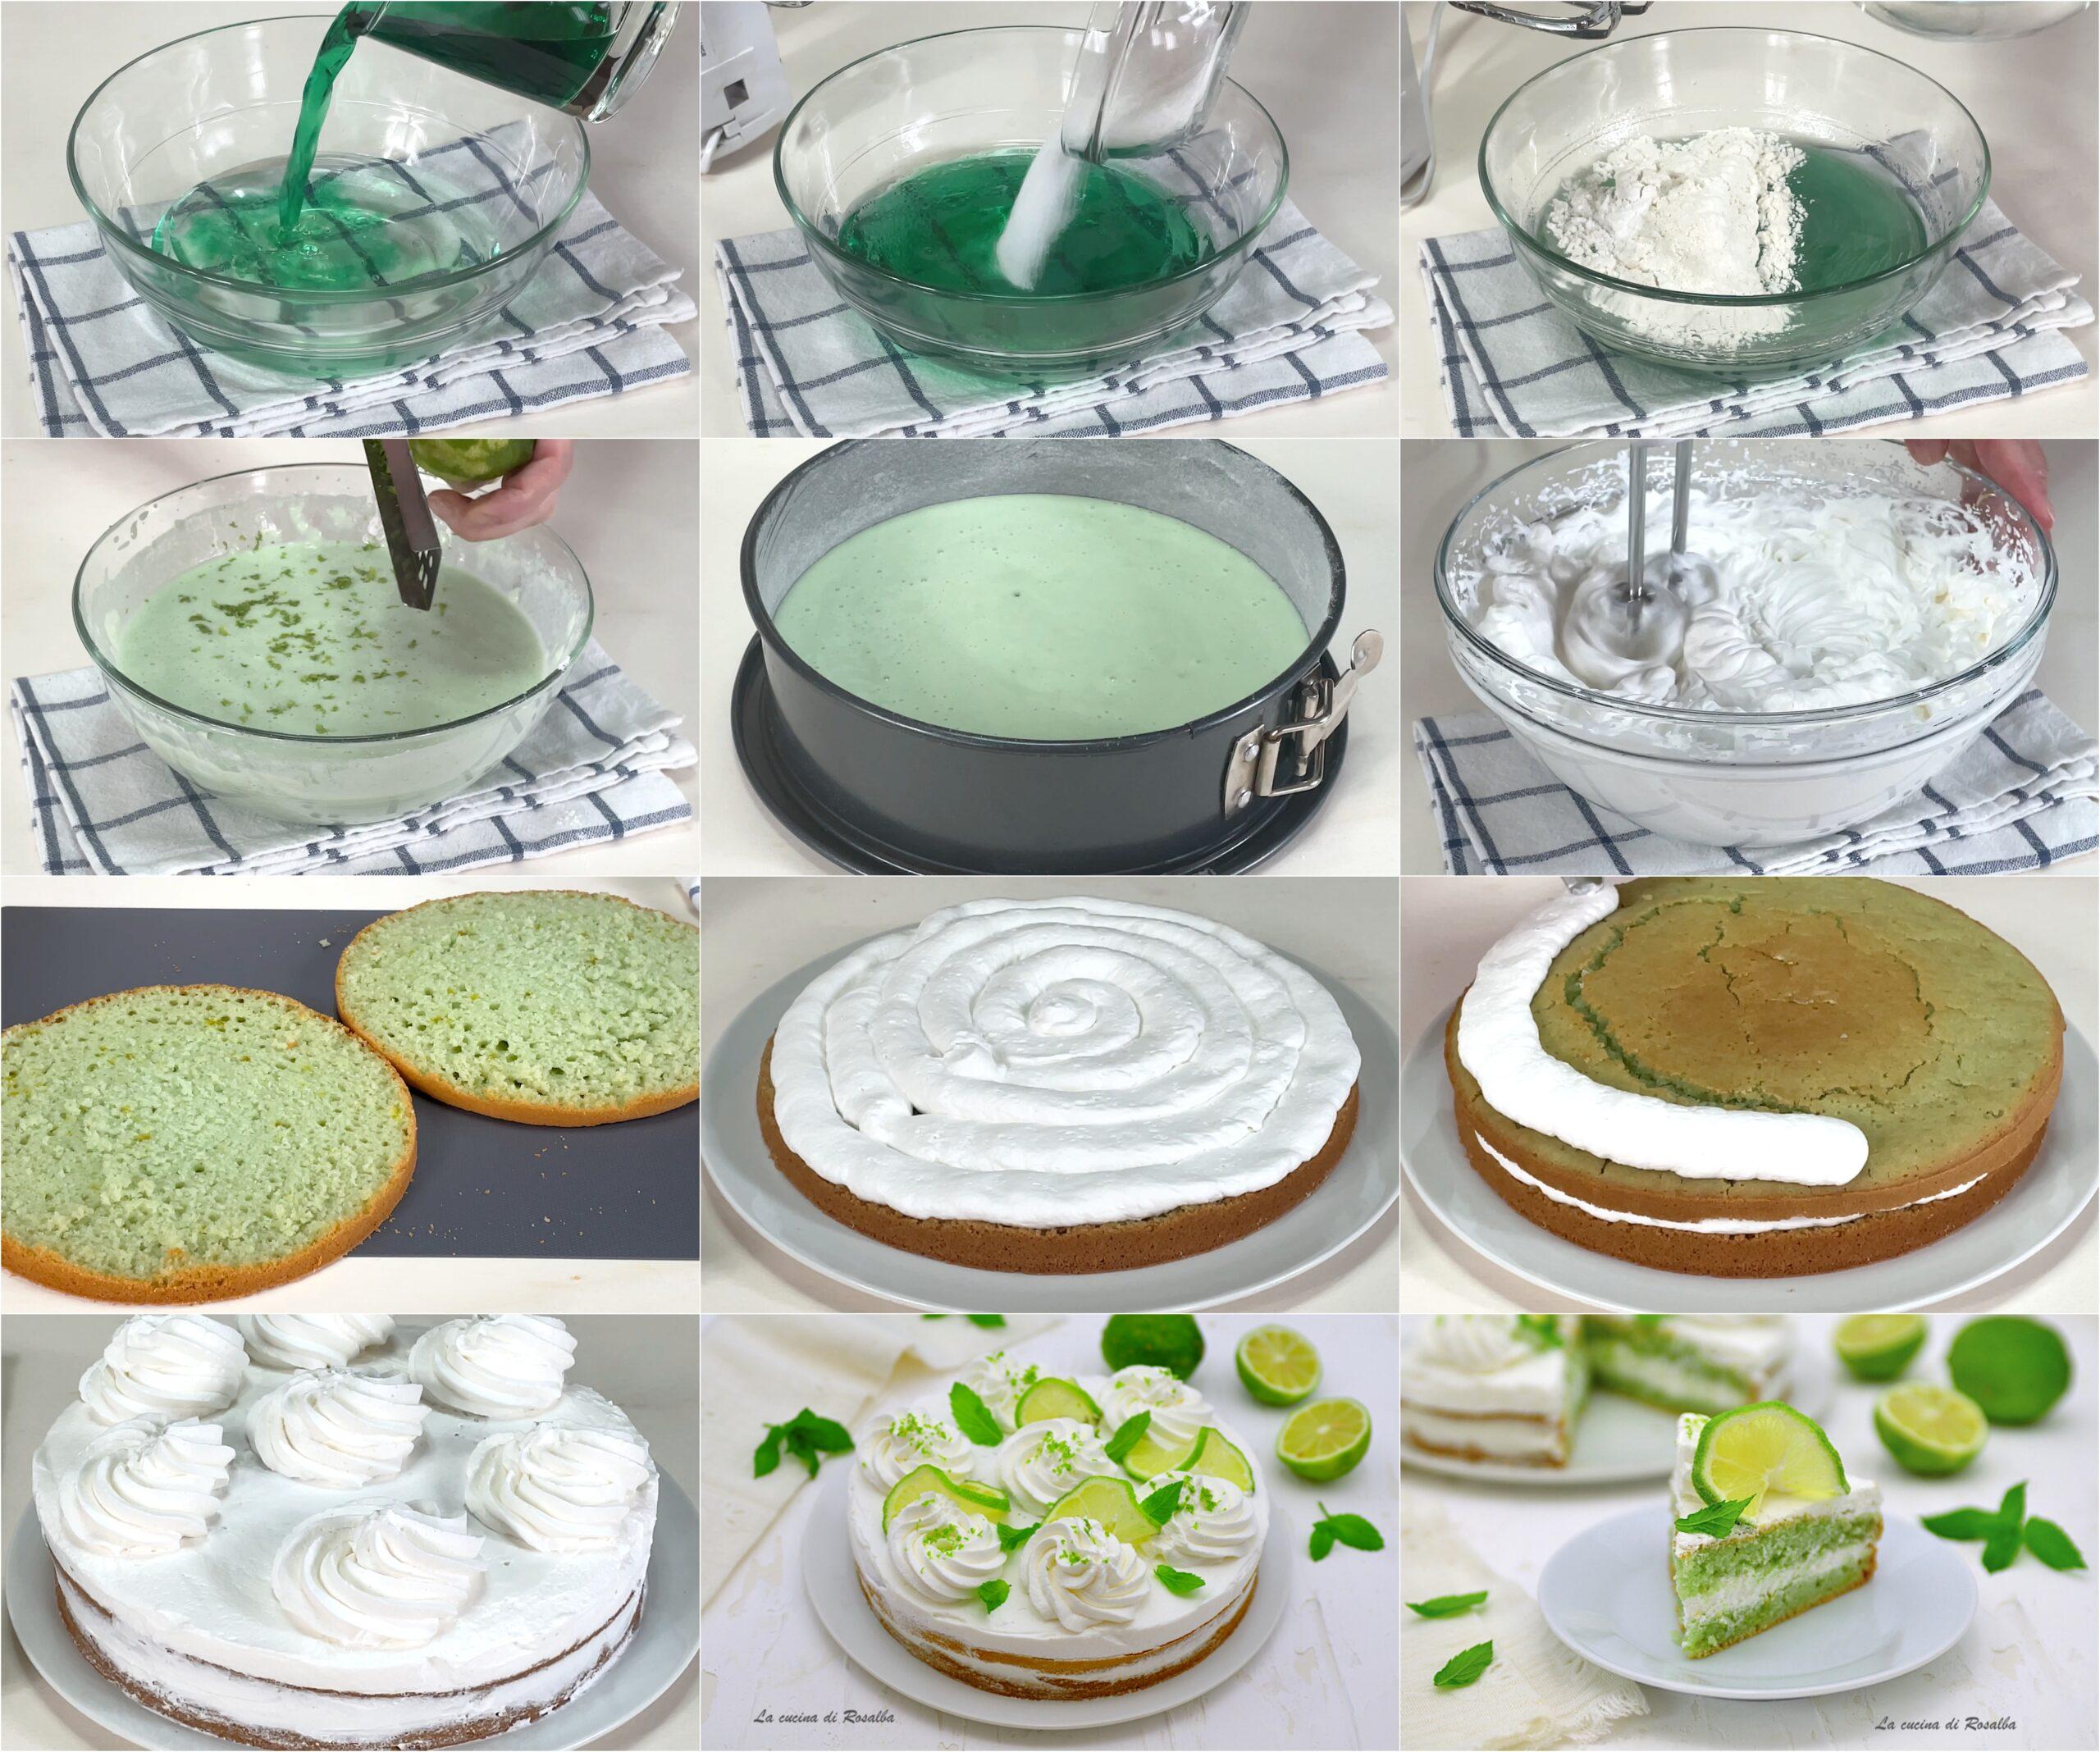 ricetta torta alla menta e lime senza uova